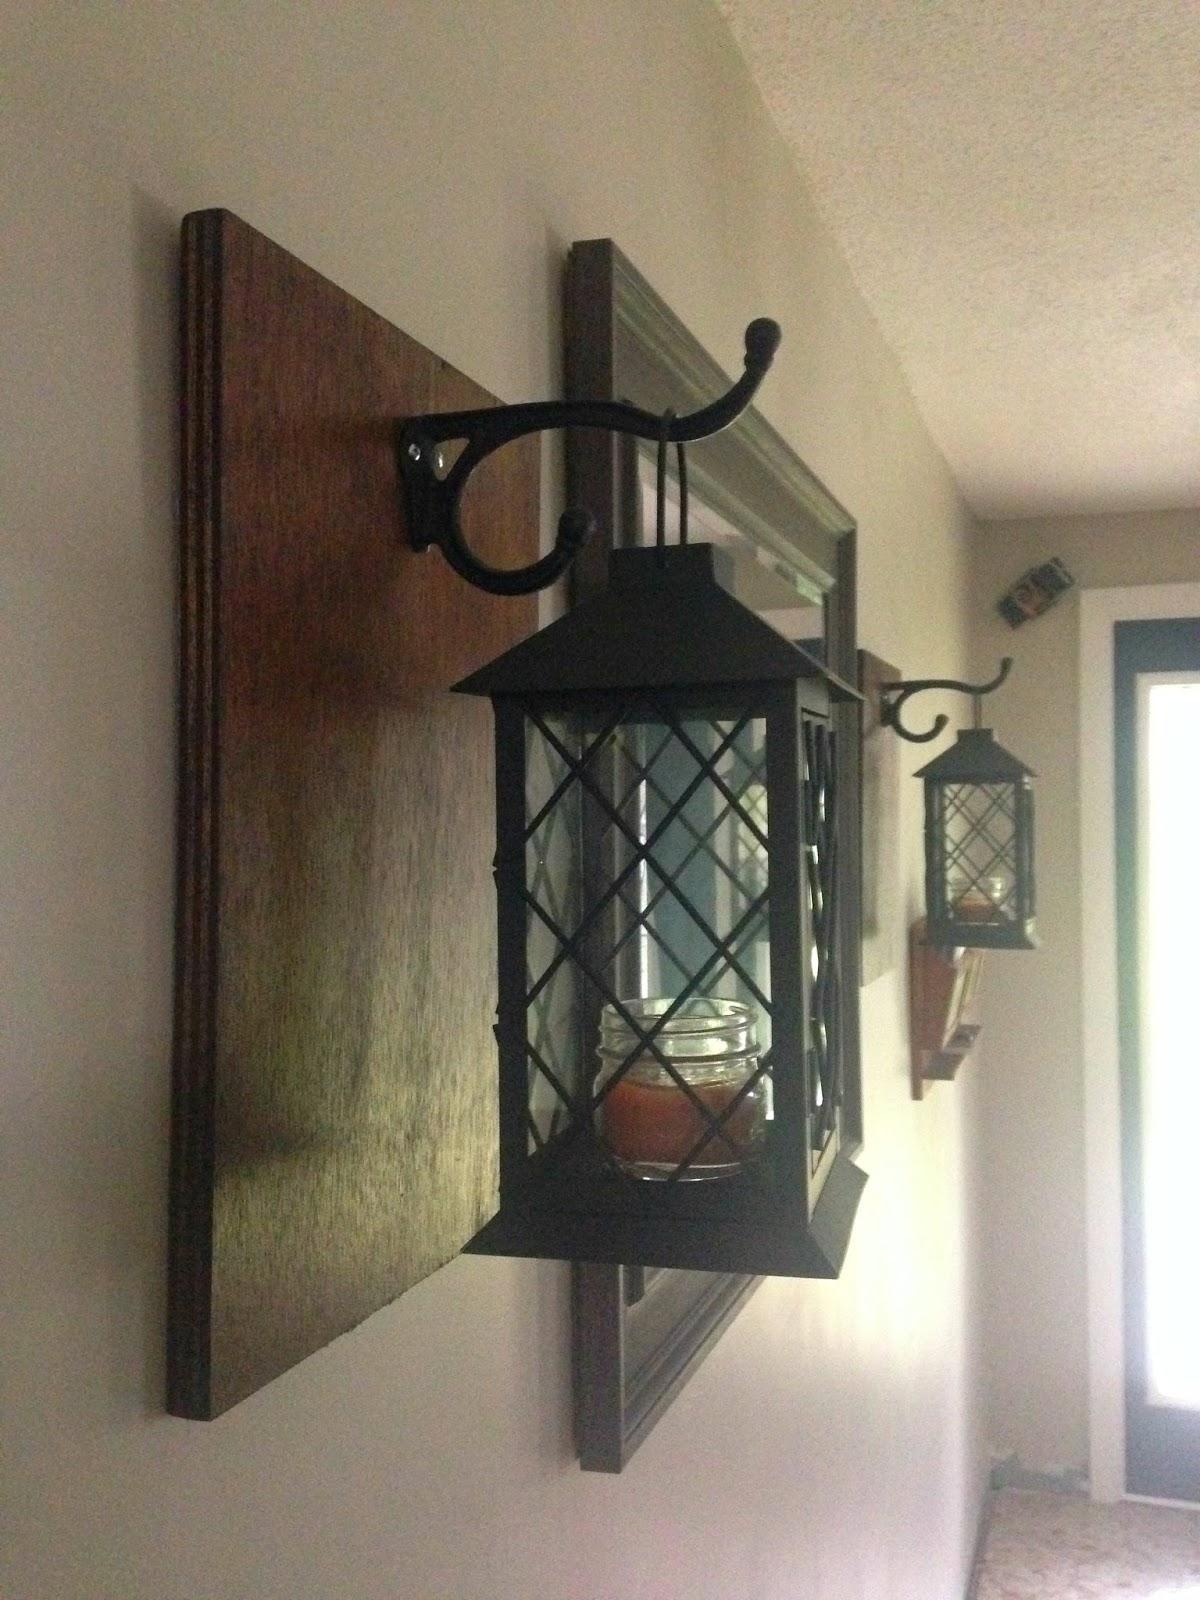 Wall Lantern Decor : Drew Danielle Design: DIY Lantern Wall Decor